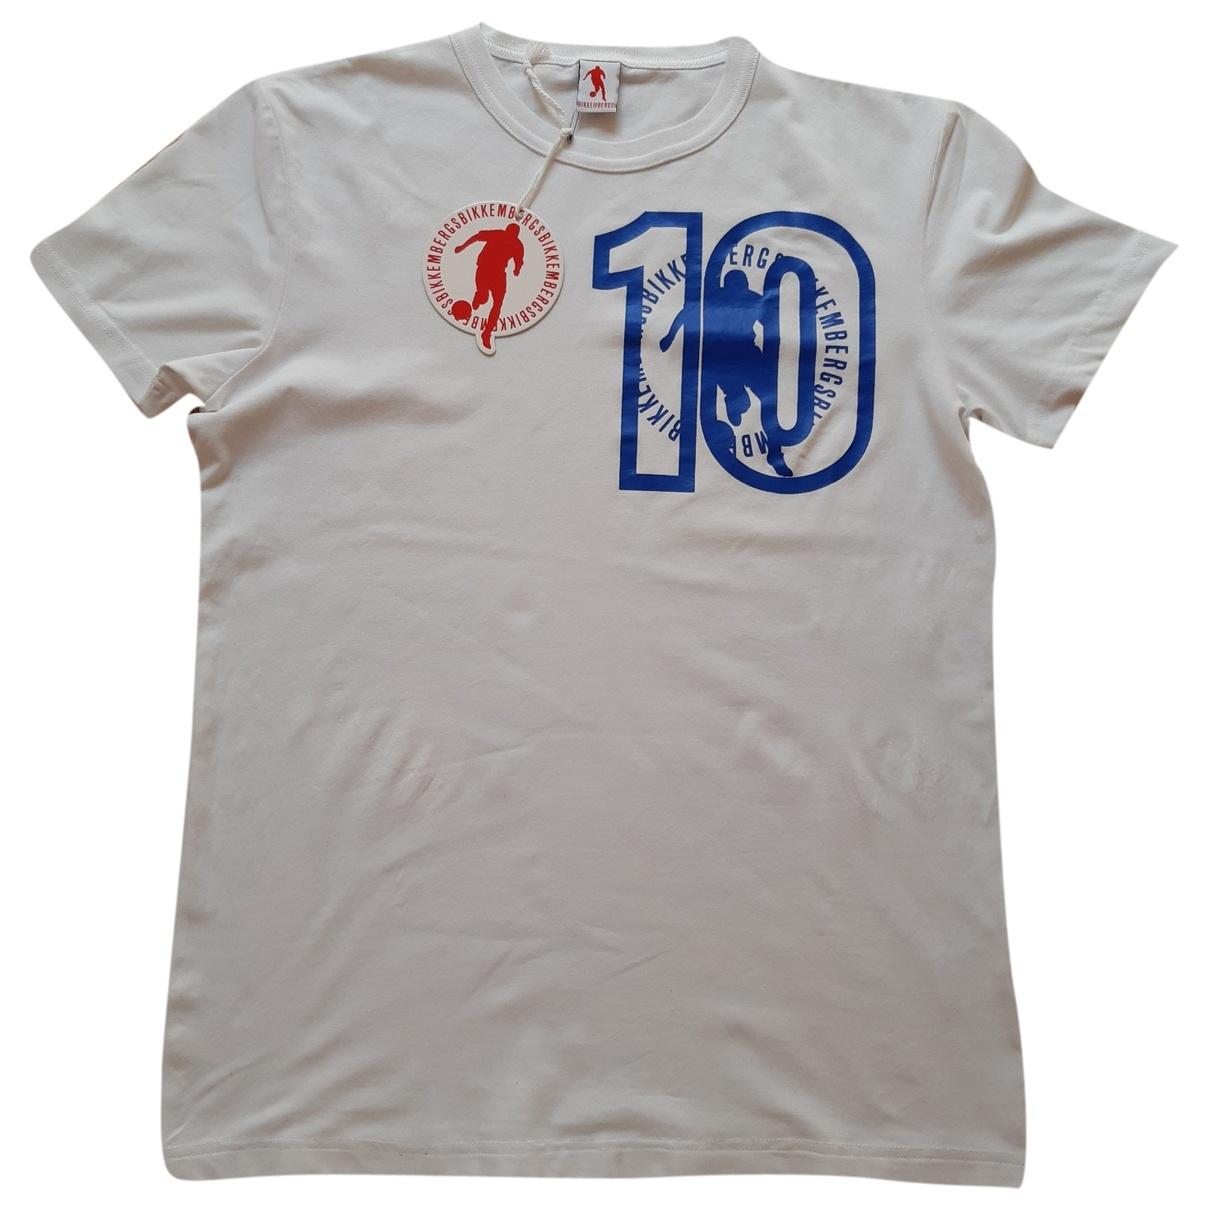 Dirk Bikkembergs \N White Cotton T-shirts for Men M International